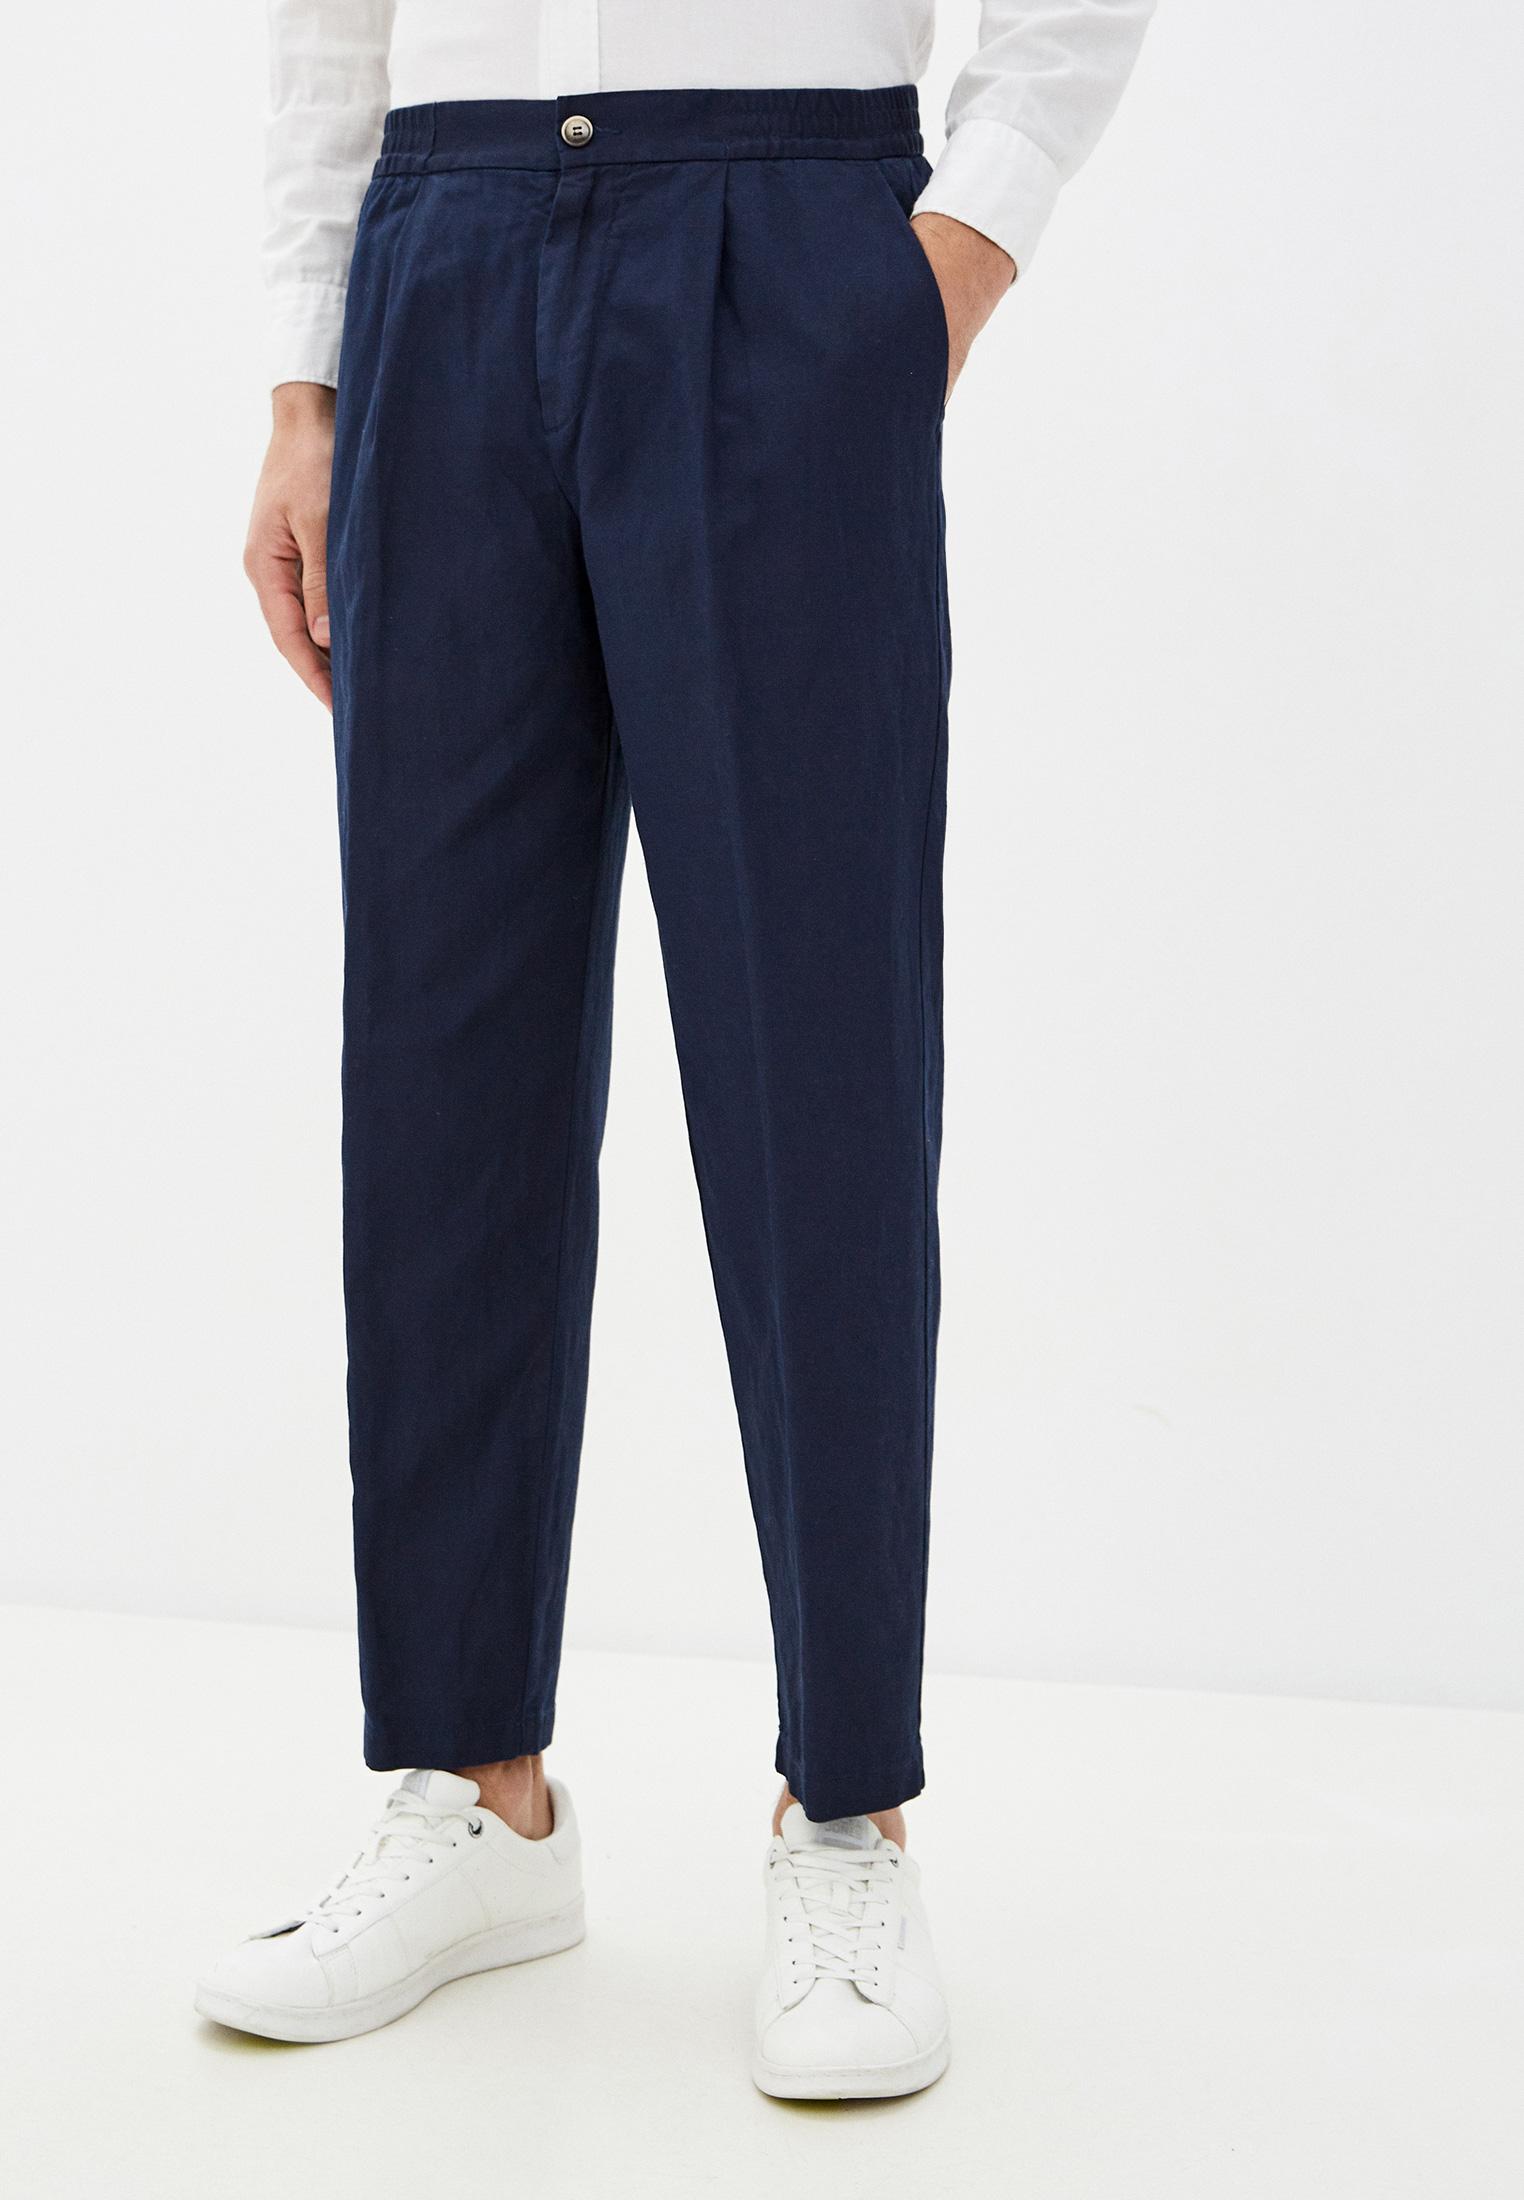 Мужские повседневные брюки United Colors of Benetton (Юнайтед Колорс оф Бенеттон) 4AAZ55I78